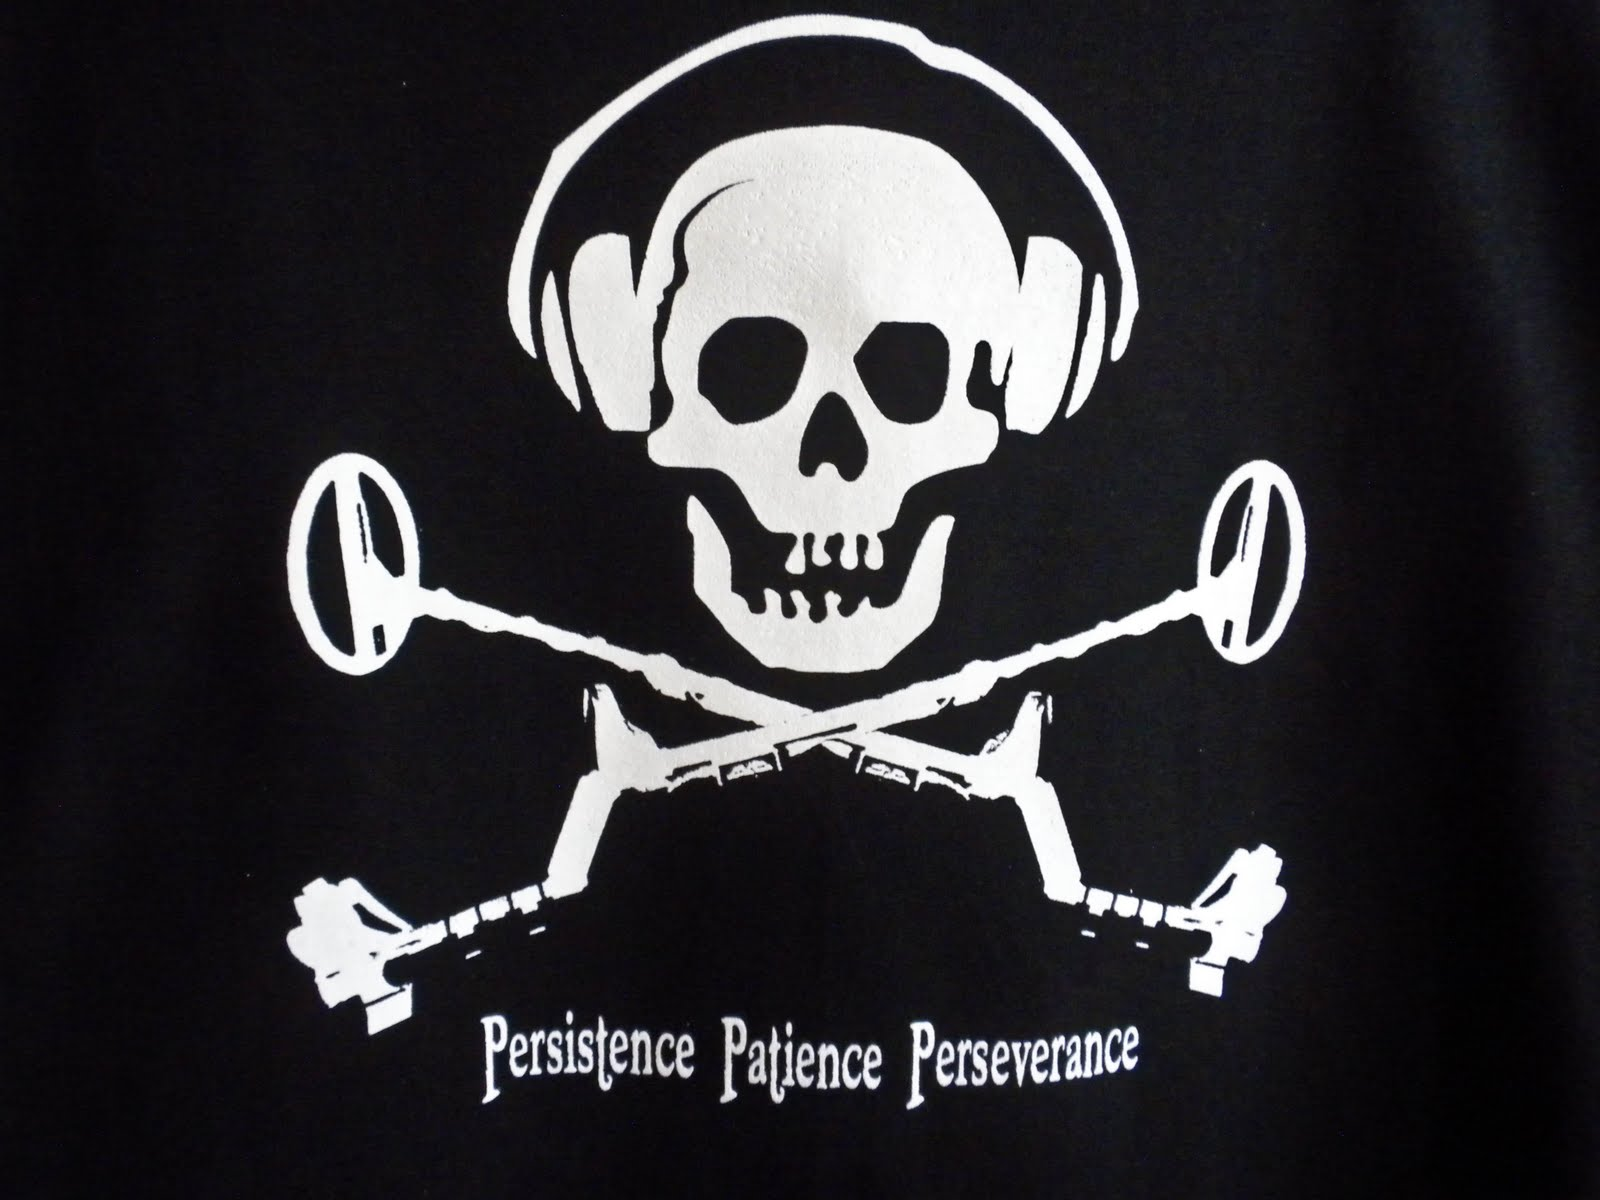 Design your own t-shirt cafepress - Cafepress Cafepress Shirt